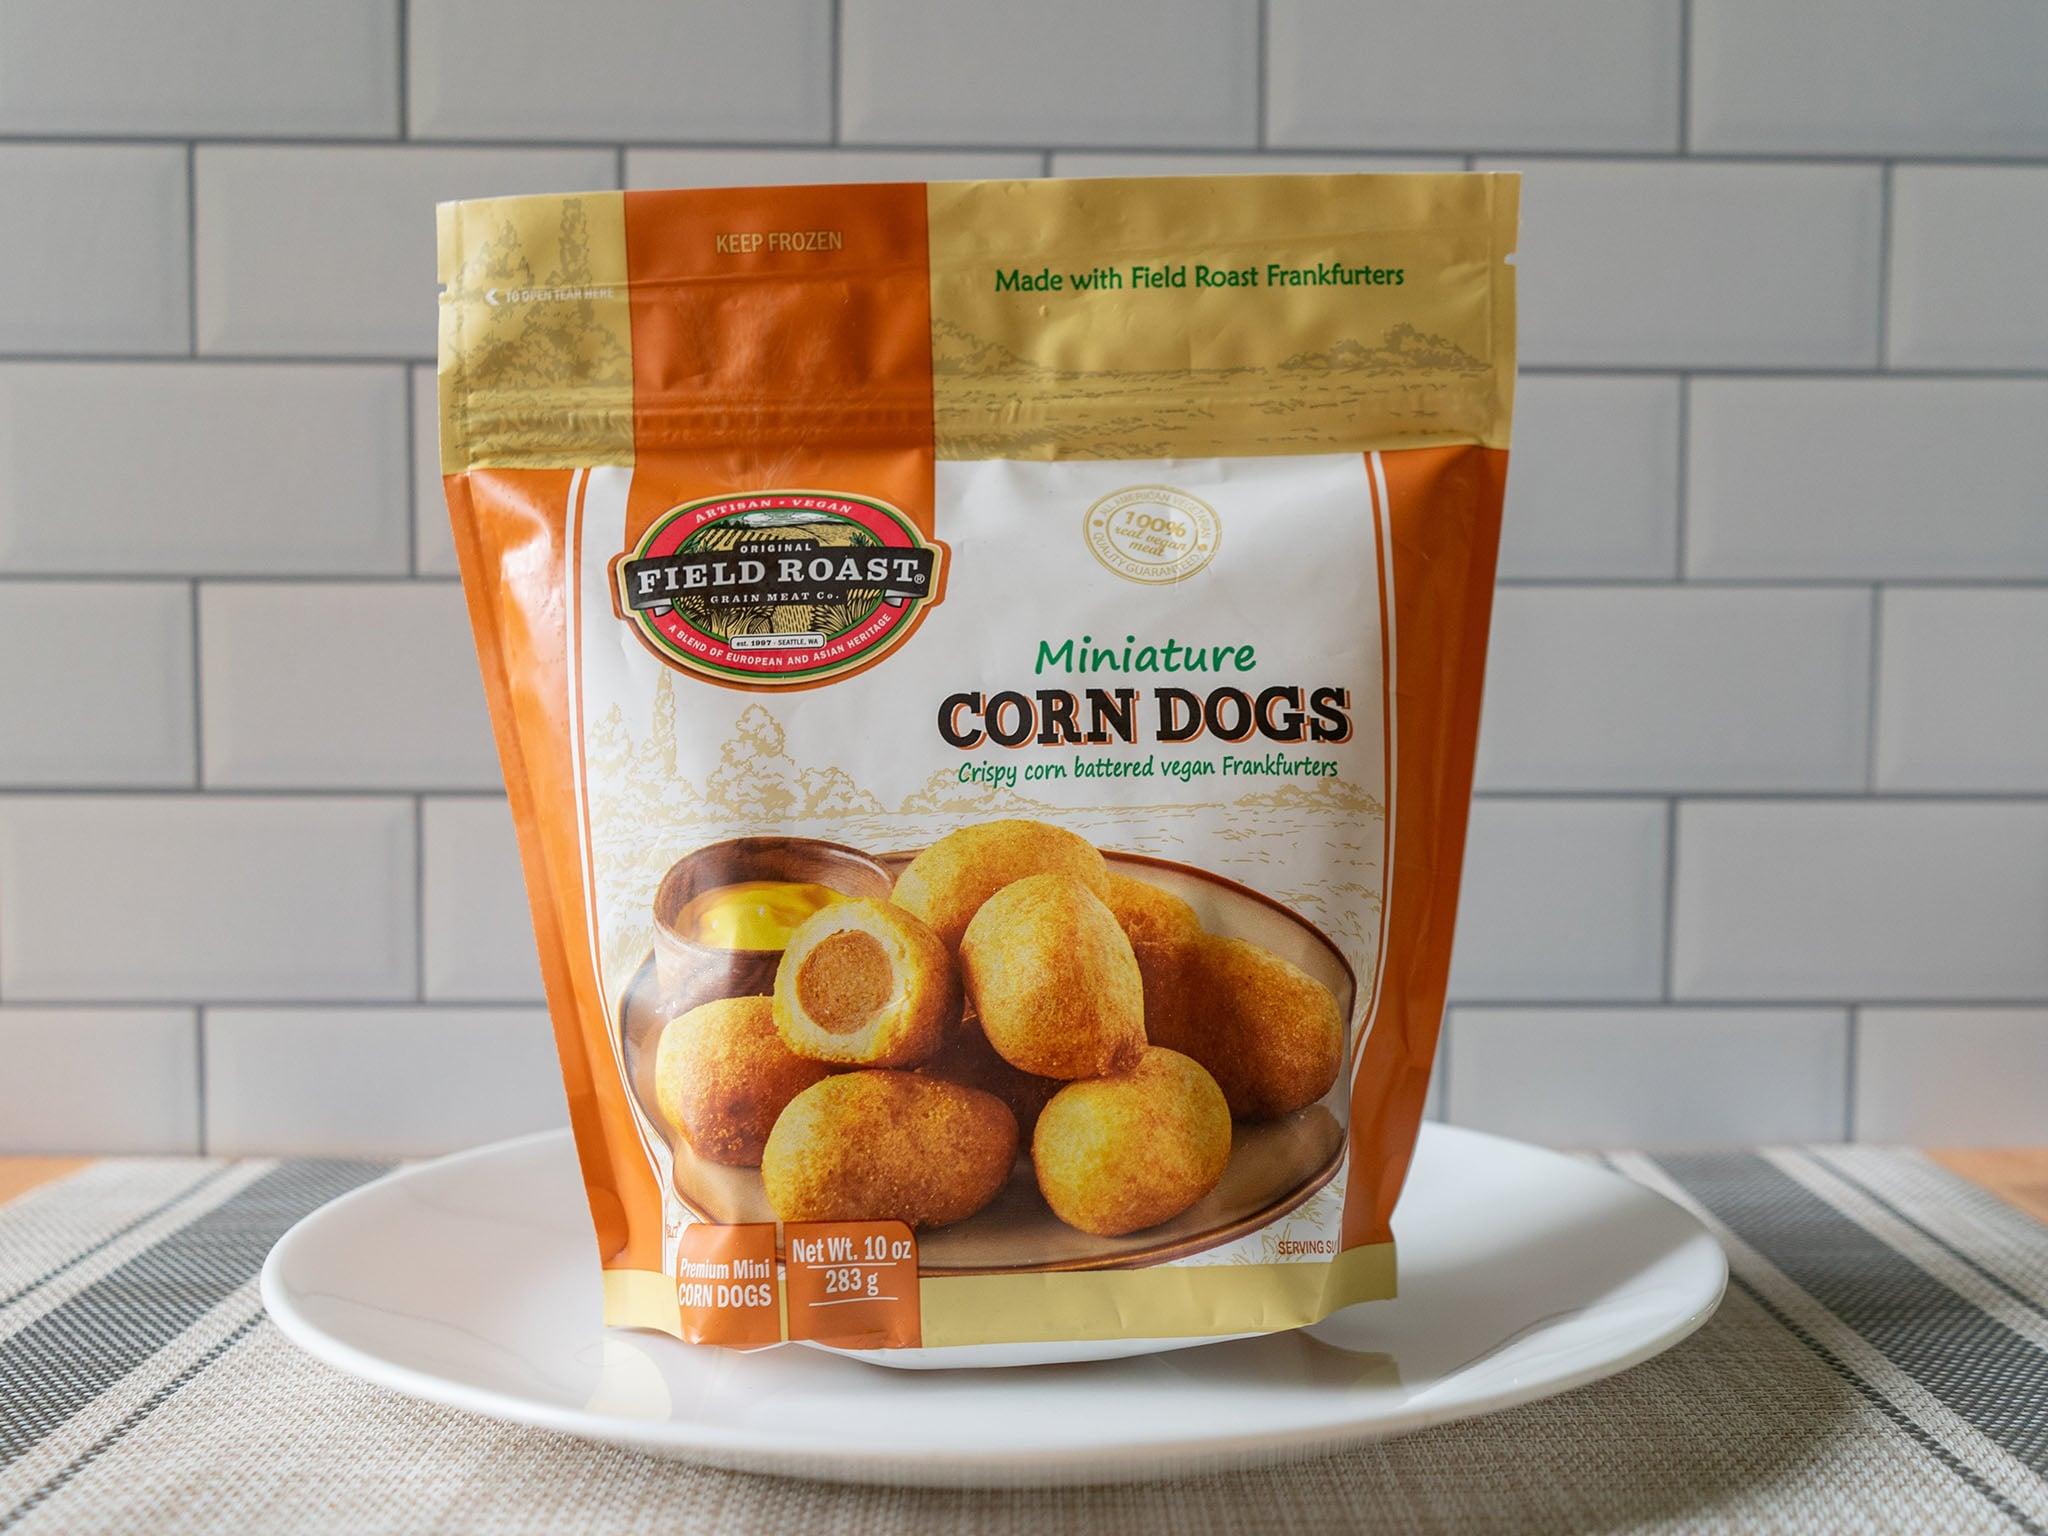 Field Roast Miniature Corn Dogs